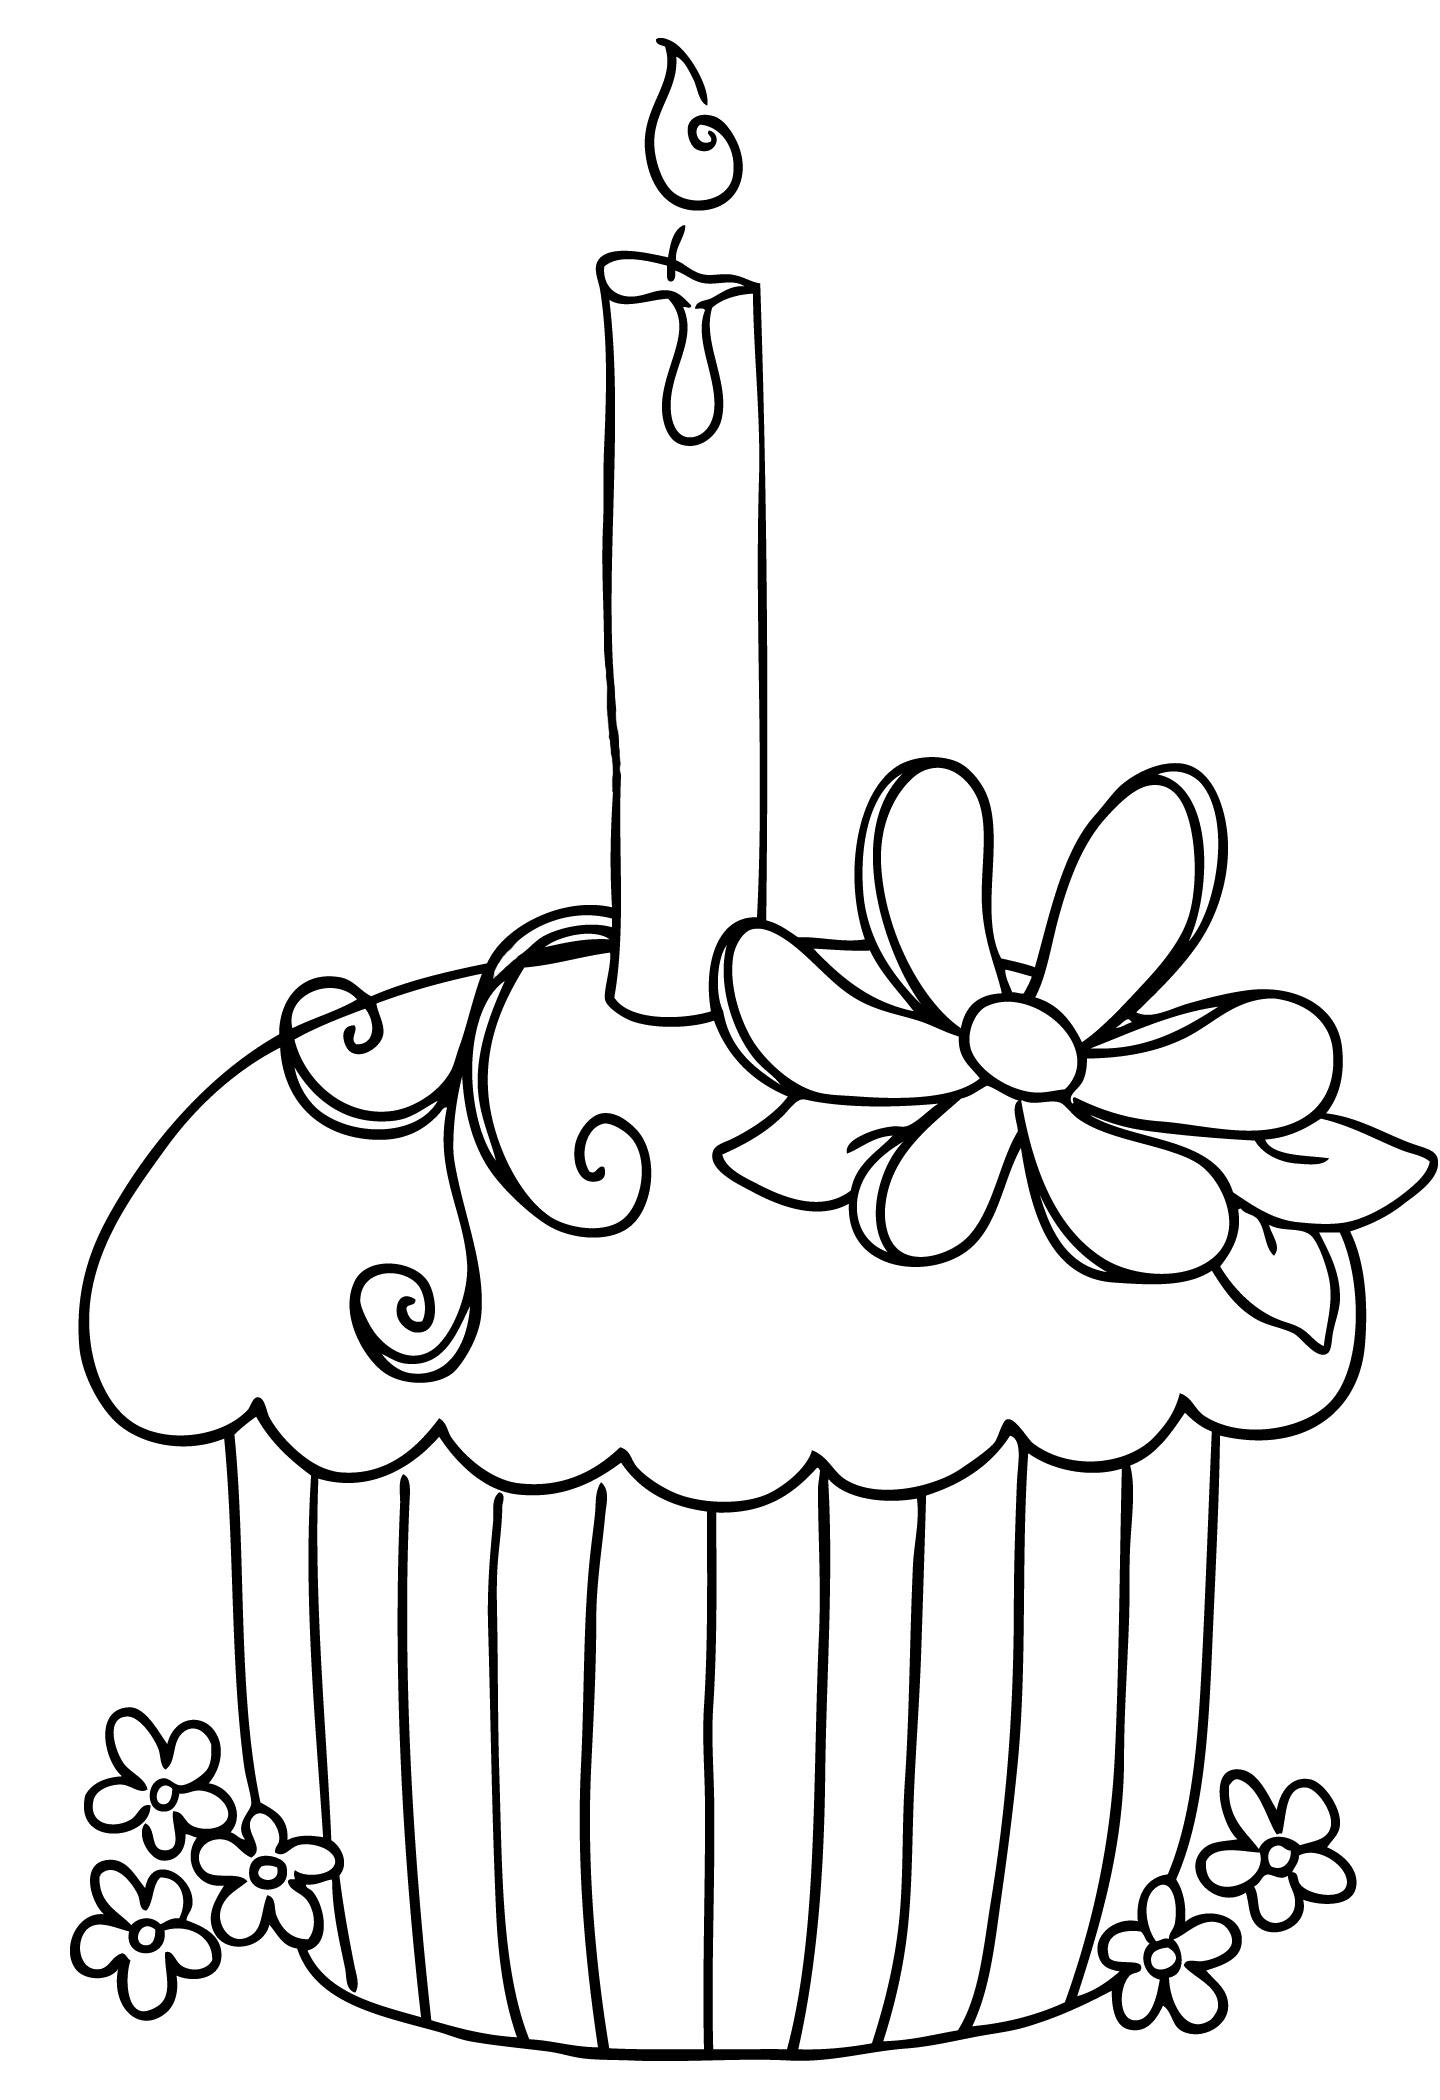 Happy birthday black and white happy birthday cake clipart.